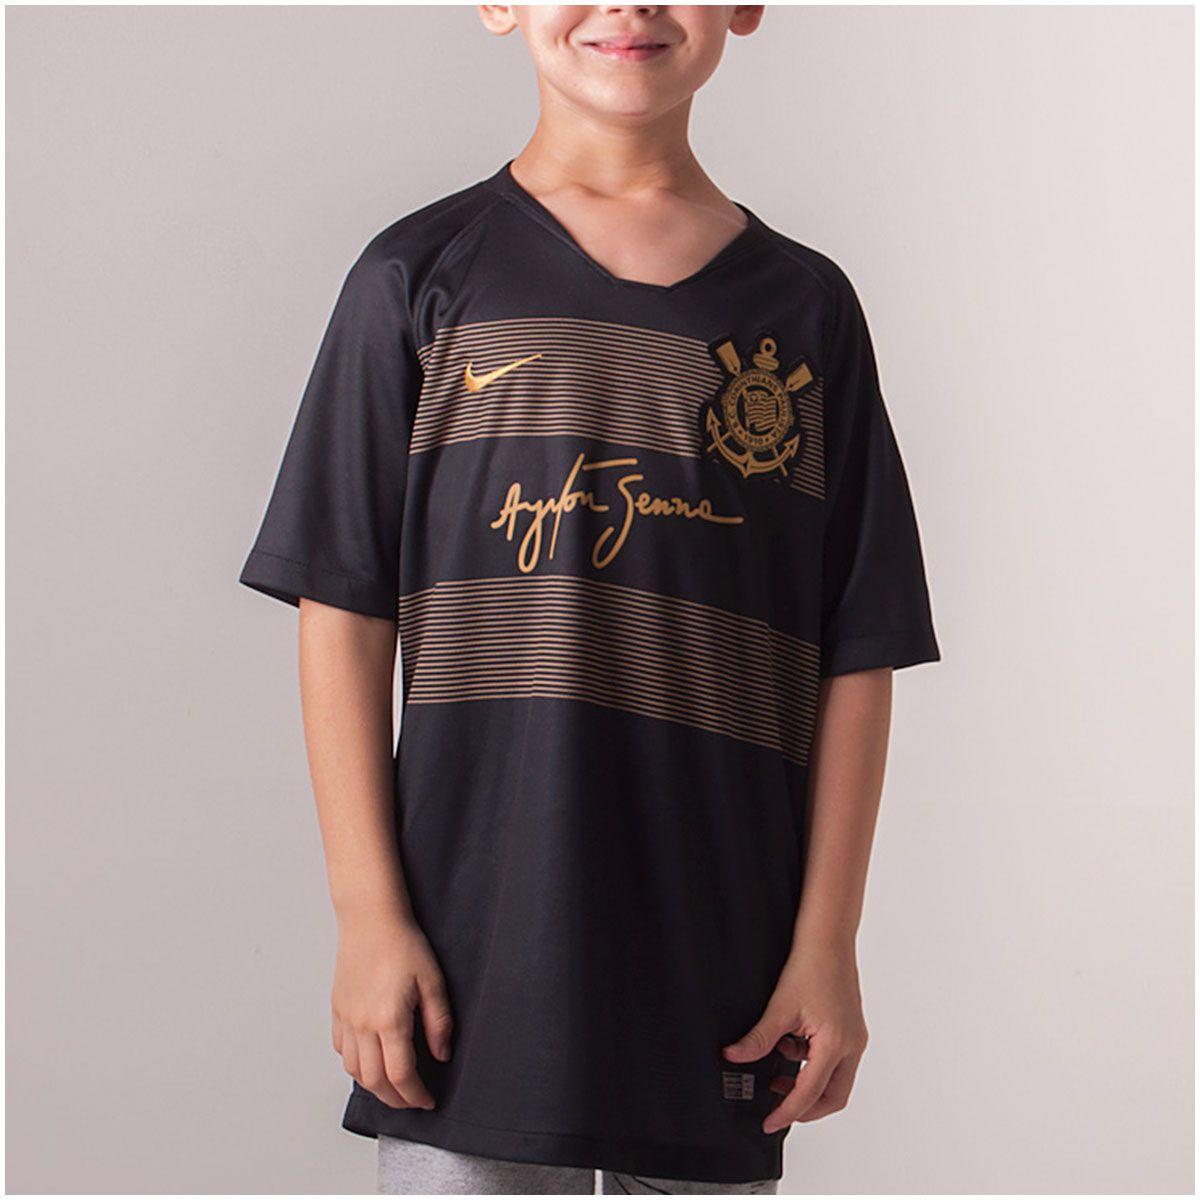 Camisa Corinthians III Nike Senna 2018 19 Infantil 88004901fde89